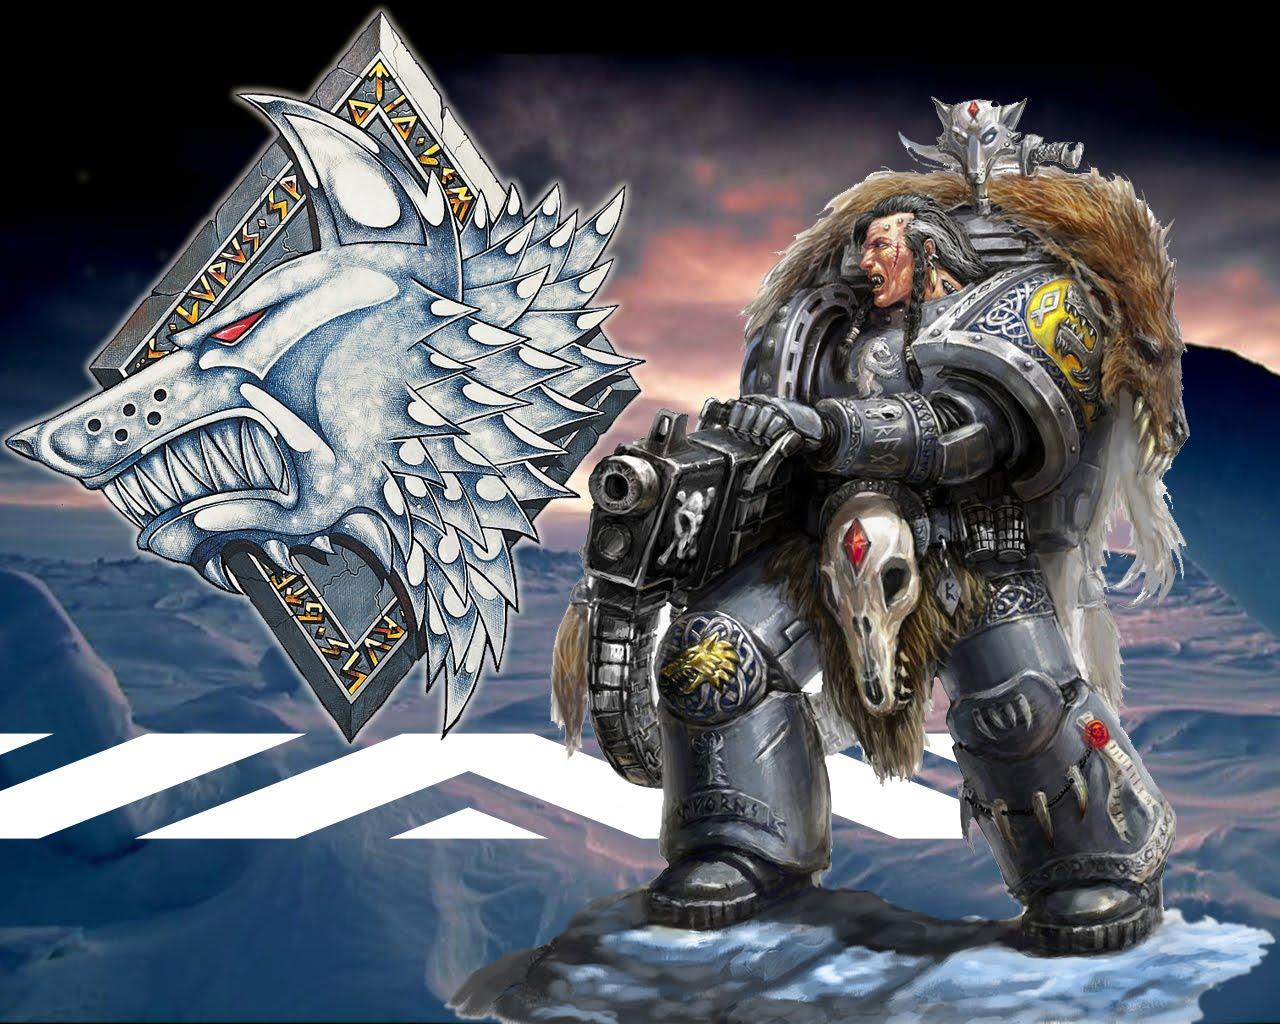 Games - WH40K Space Wolves | Galeria de imagenes